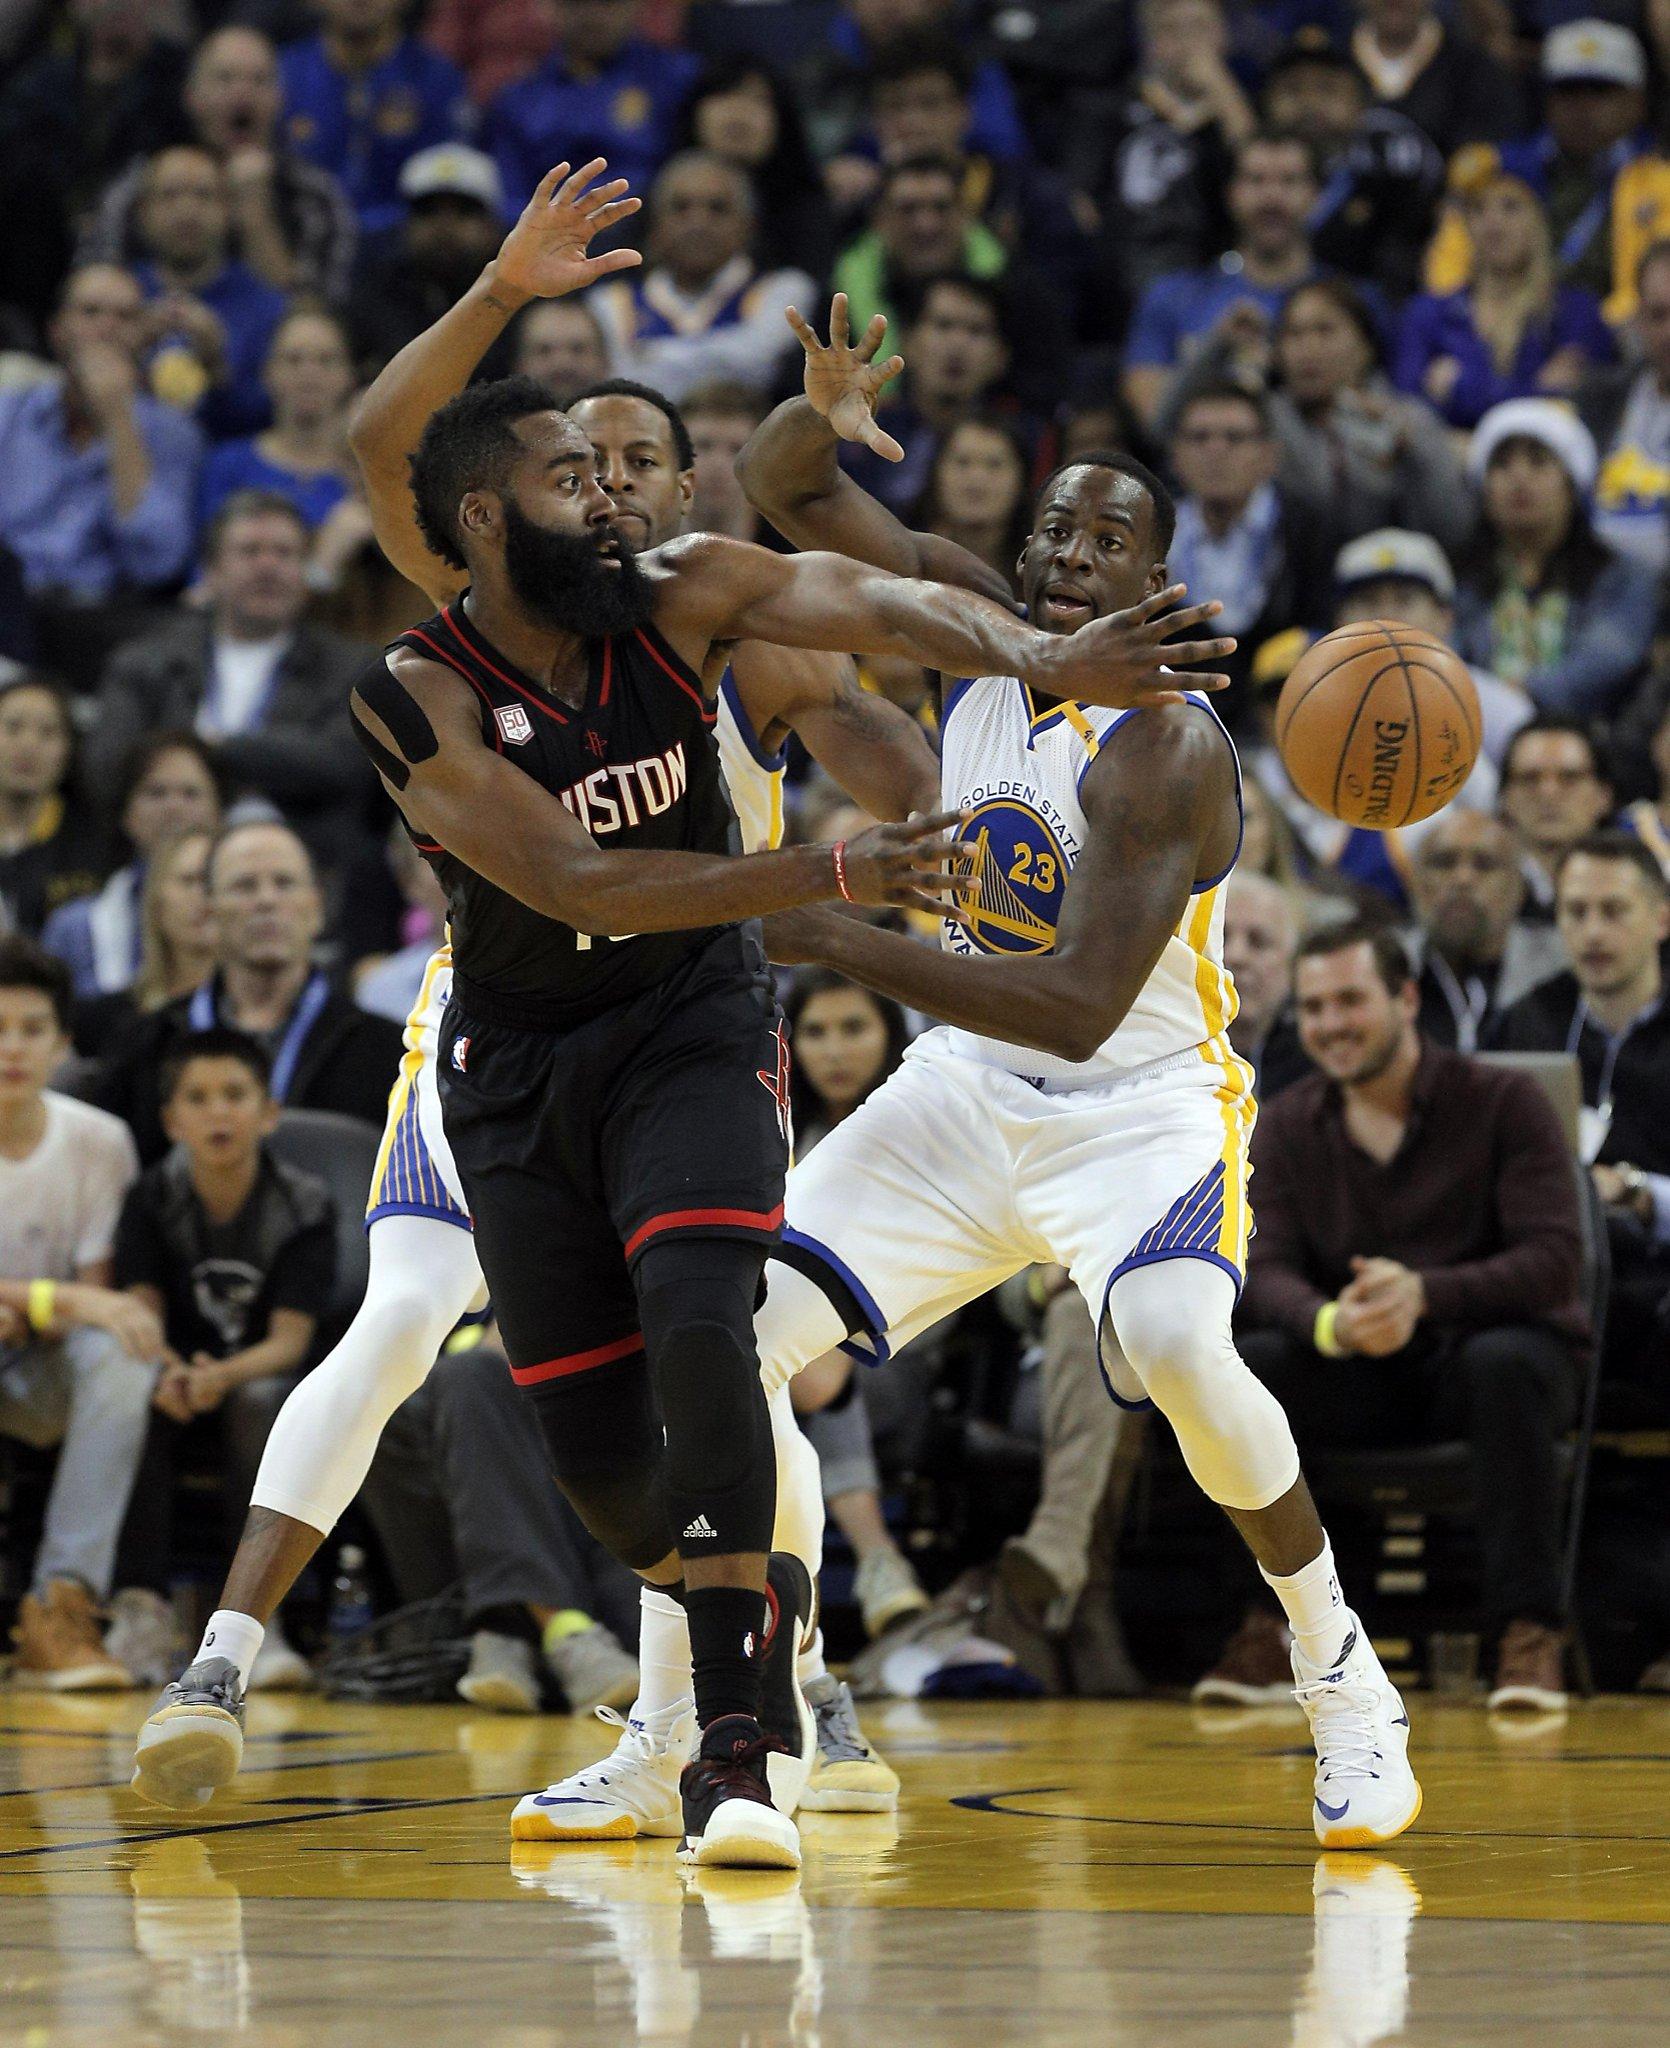 Rockets Vs Warriors James Harden: Rockets Overcome Warriors In 2-OT Thriller